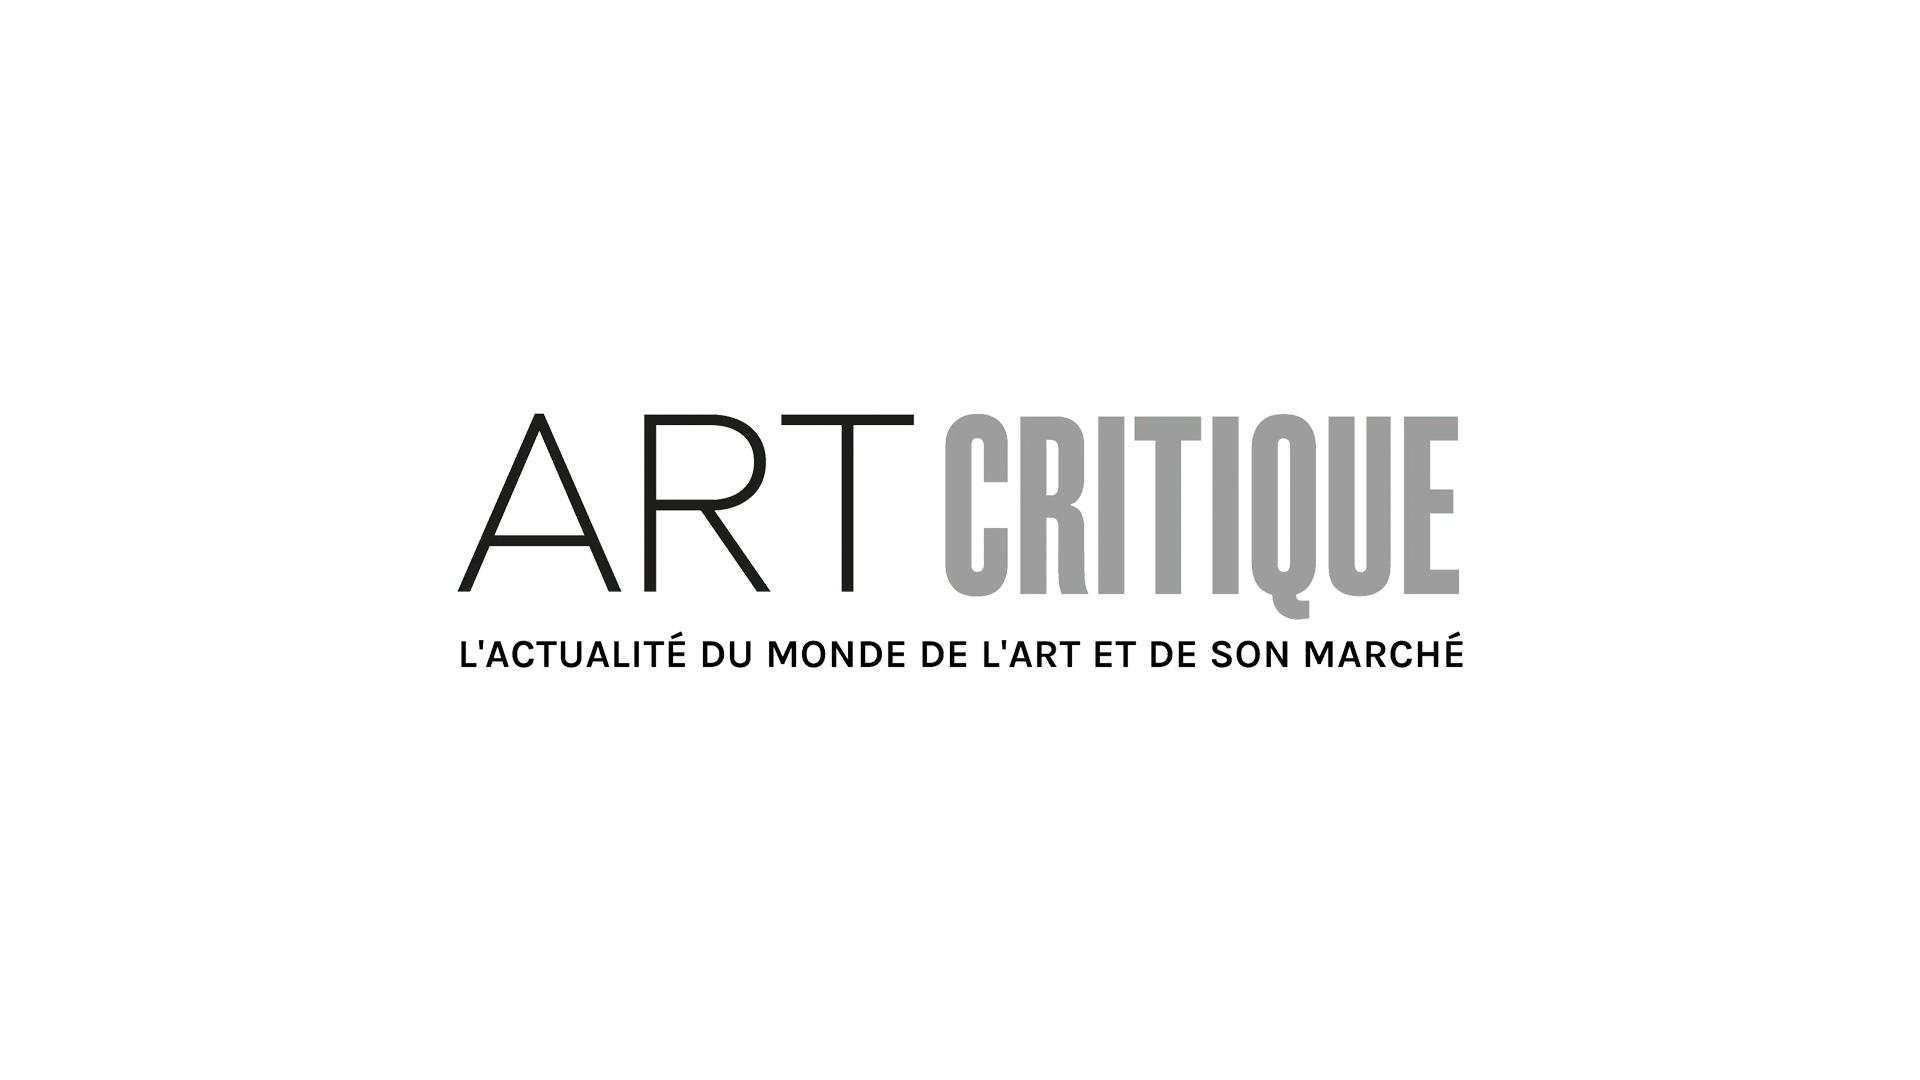 Despite Egyptian protests, sculpture of Tutankhamun sells for £4.7 million